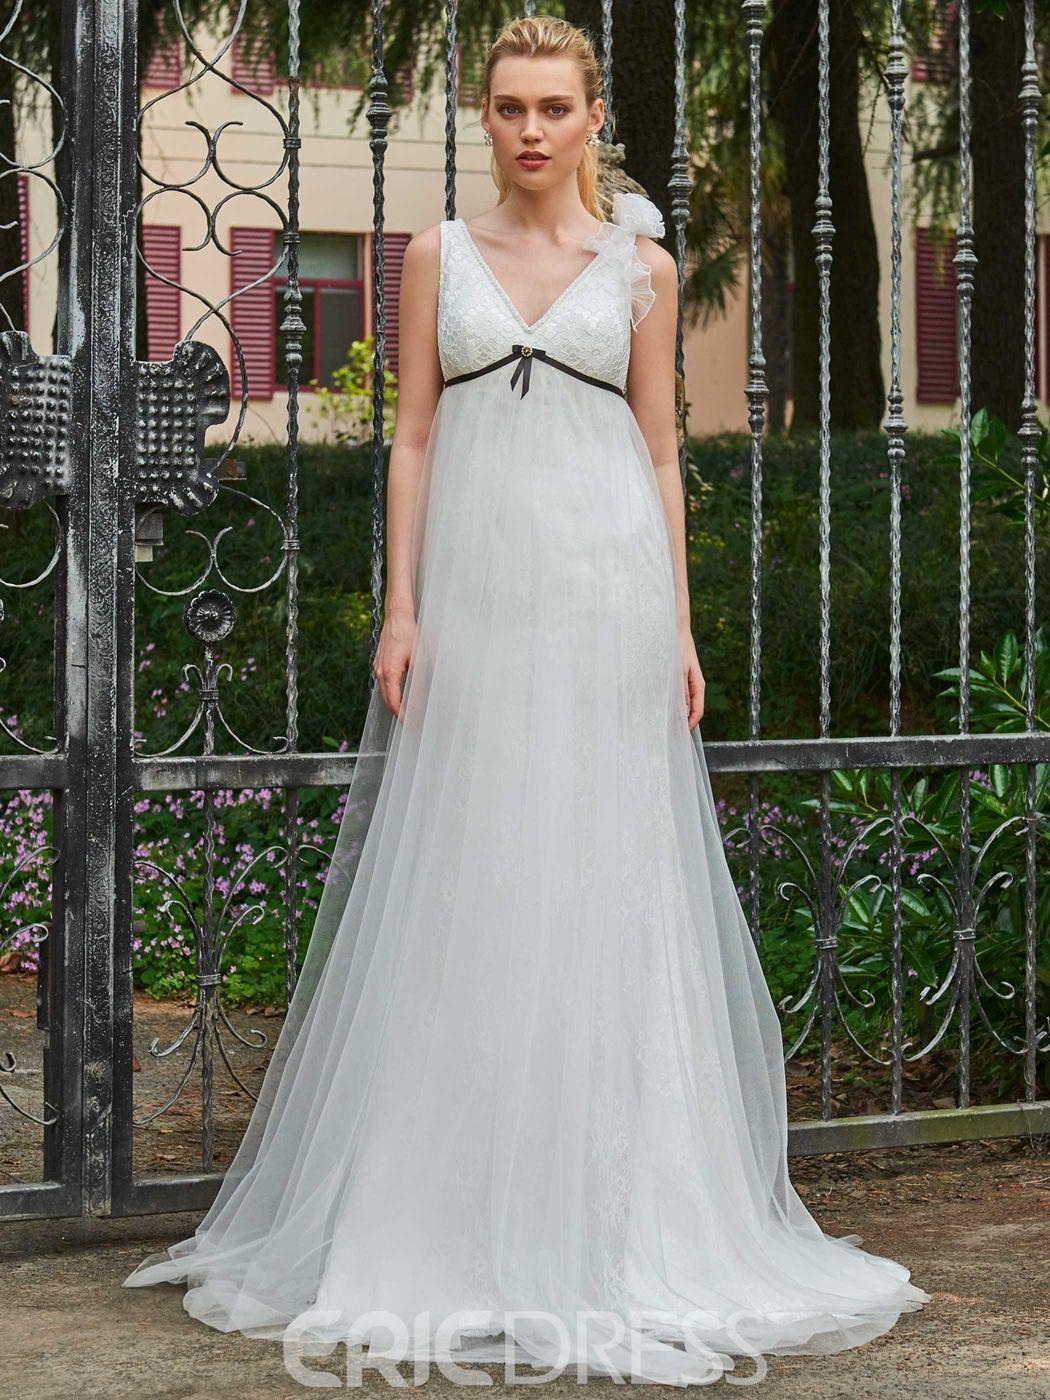 Long dresses for wedding party  V Neck Empire Sheath Tulle Wedding Dress  Pinterest  Wedding dress